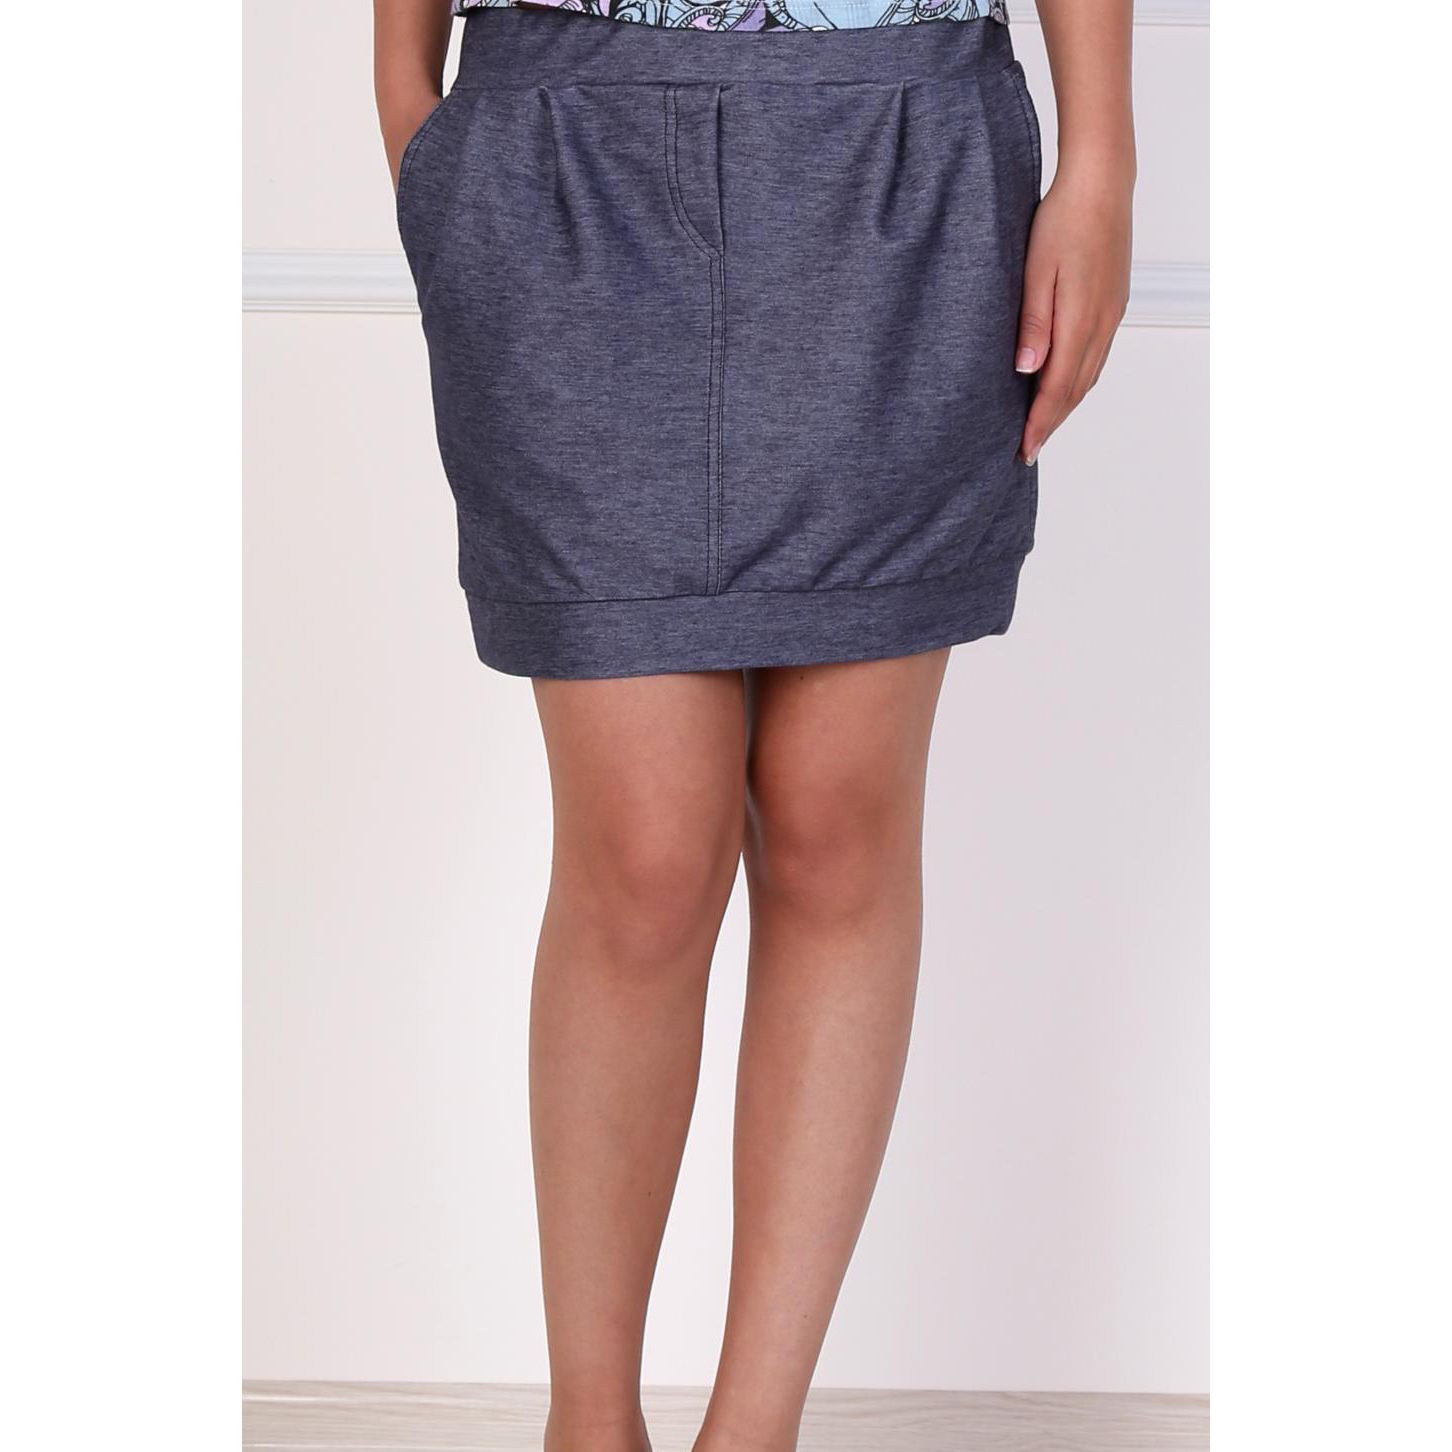 Женская юбка Зара Синий, размер 42Шорты, бриджи, брюки<br>Обхват талии:65 см<br>Обхват бедер:92 см<br>Рост:167 см<br><br>Тип: Жен. юбка<br>Размер: 42<br>Материал: Футер